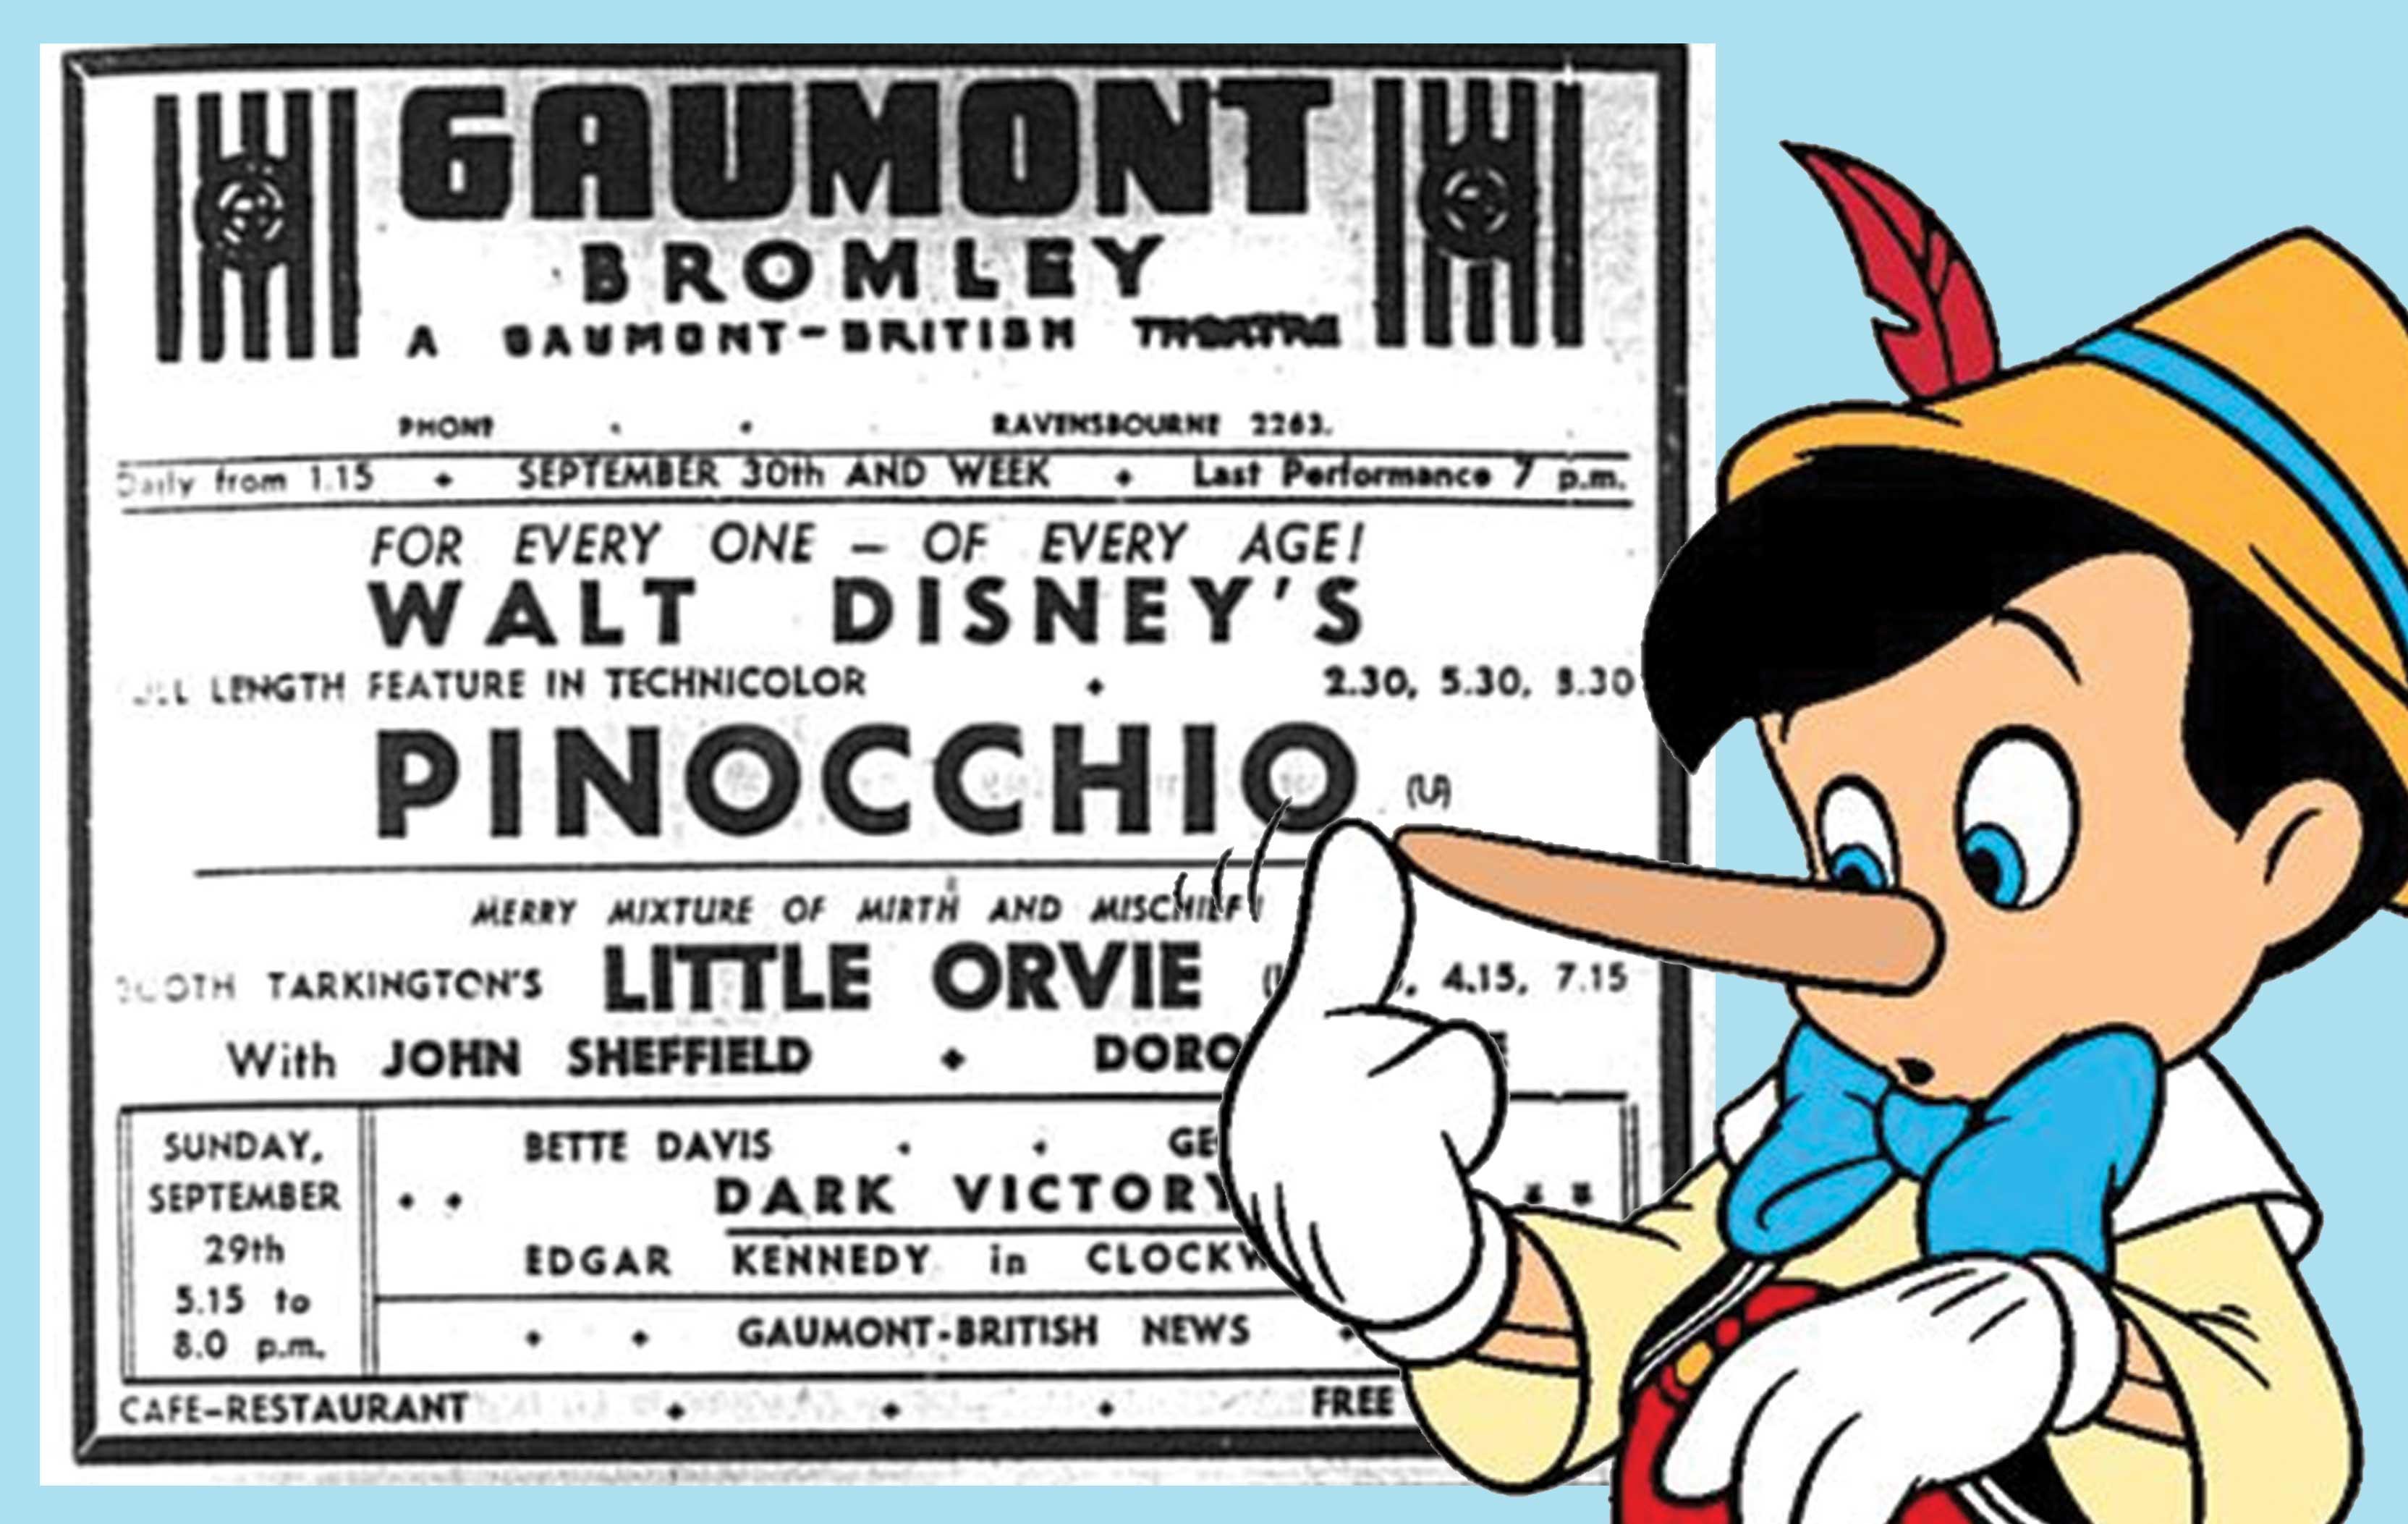 Pinocchio film listing, Bromley